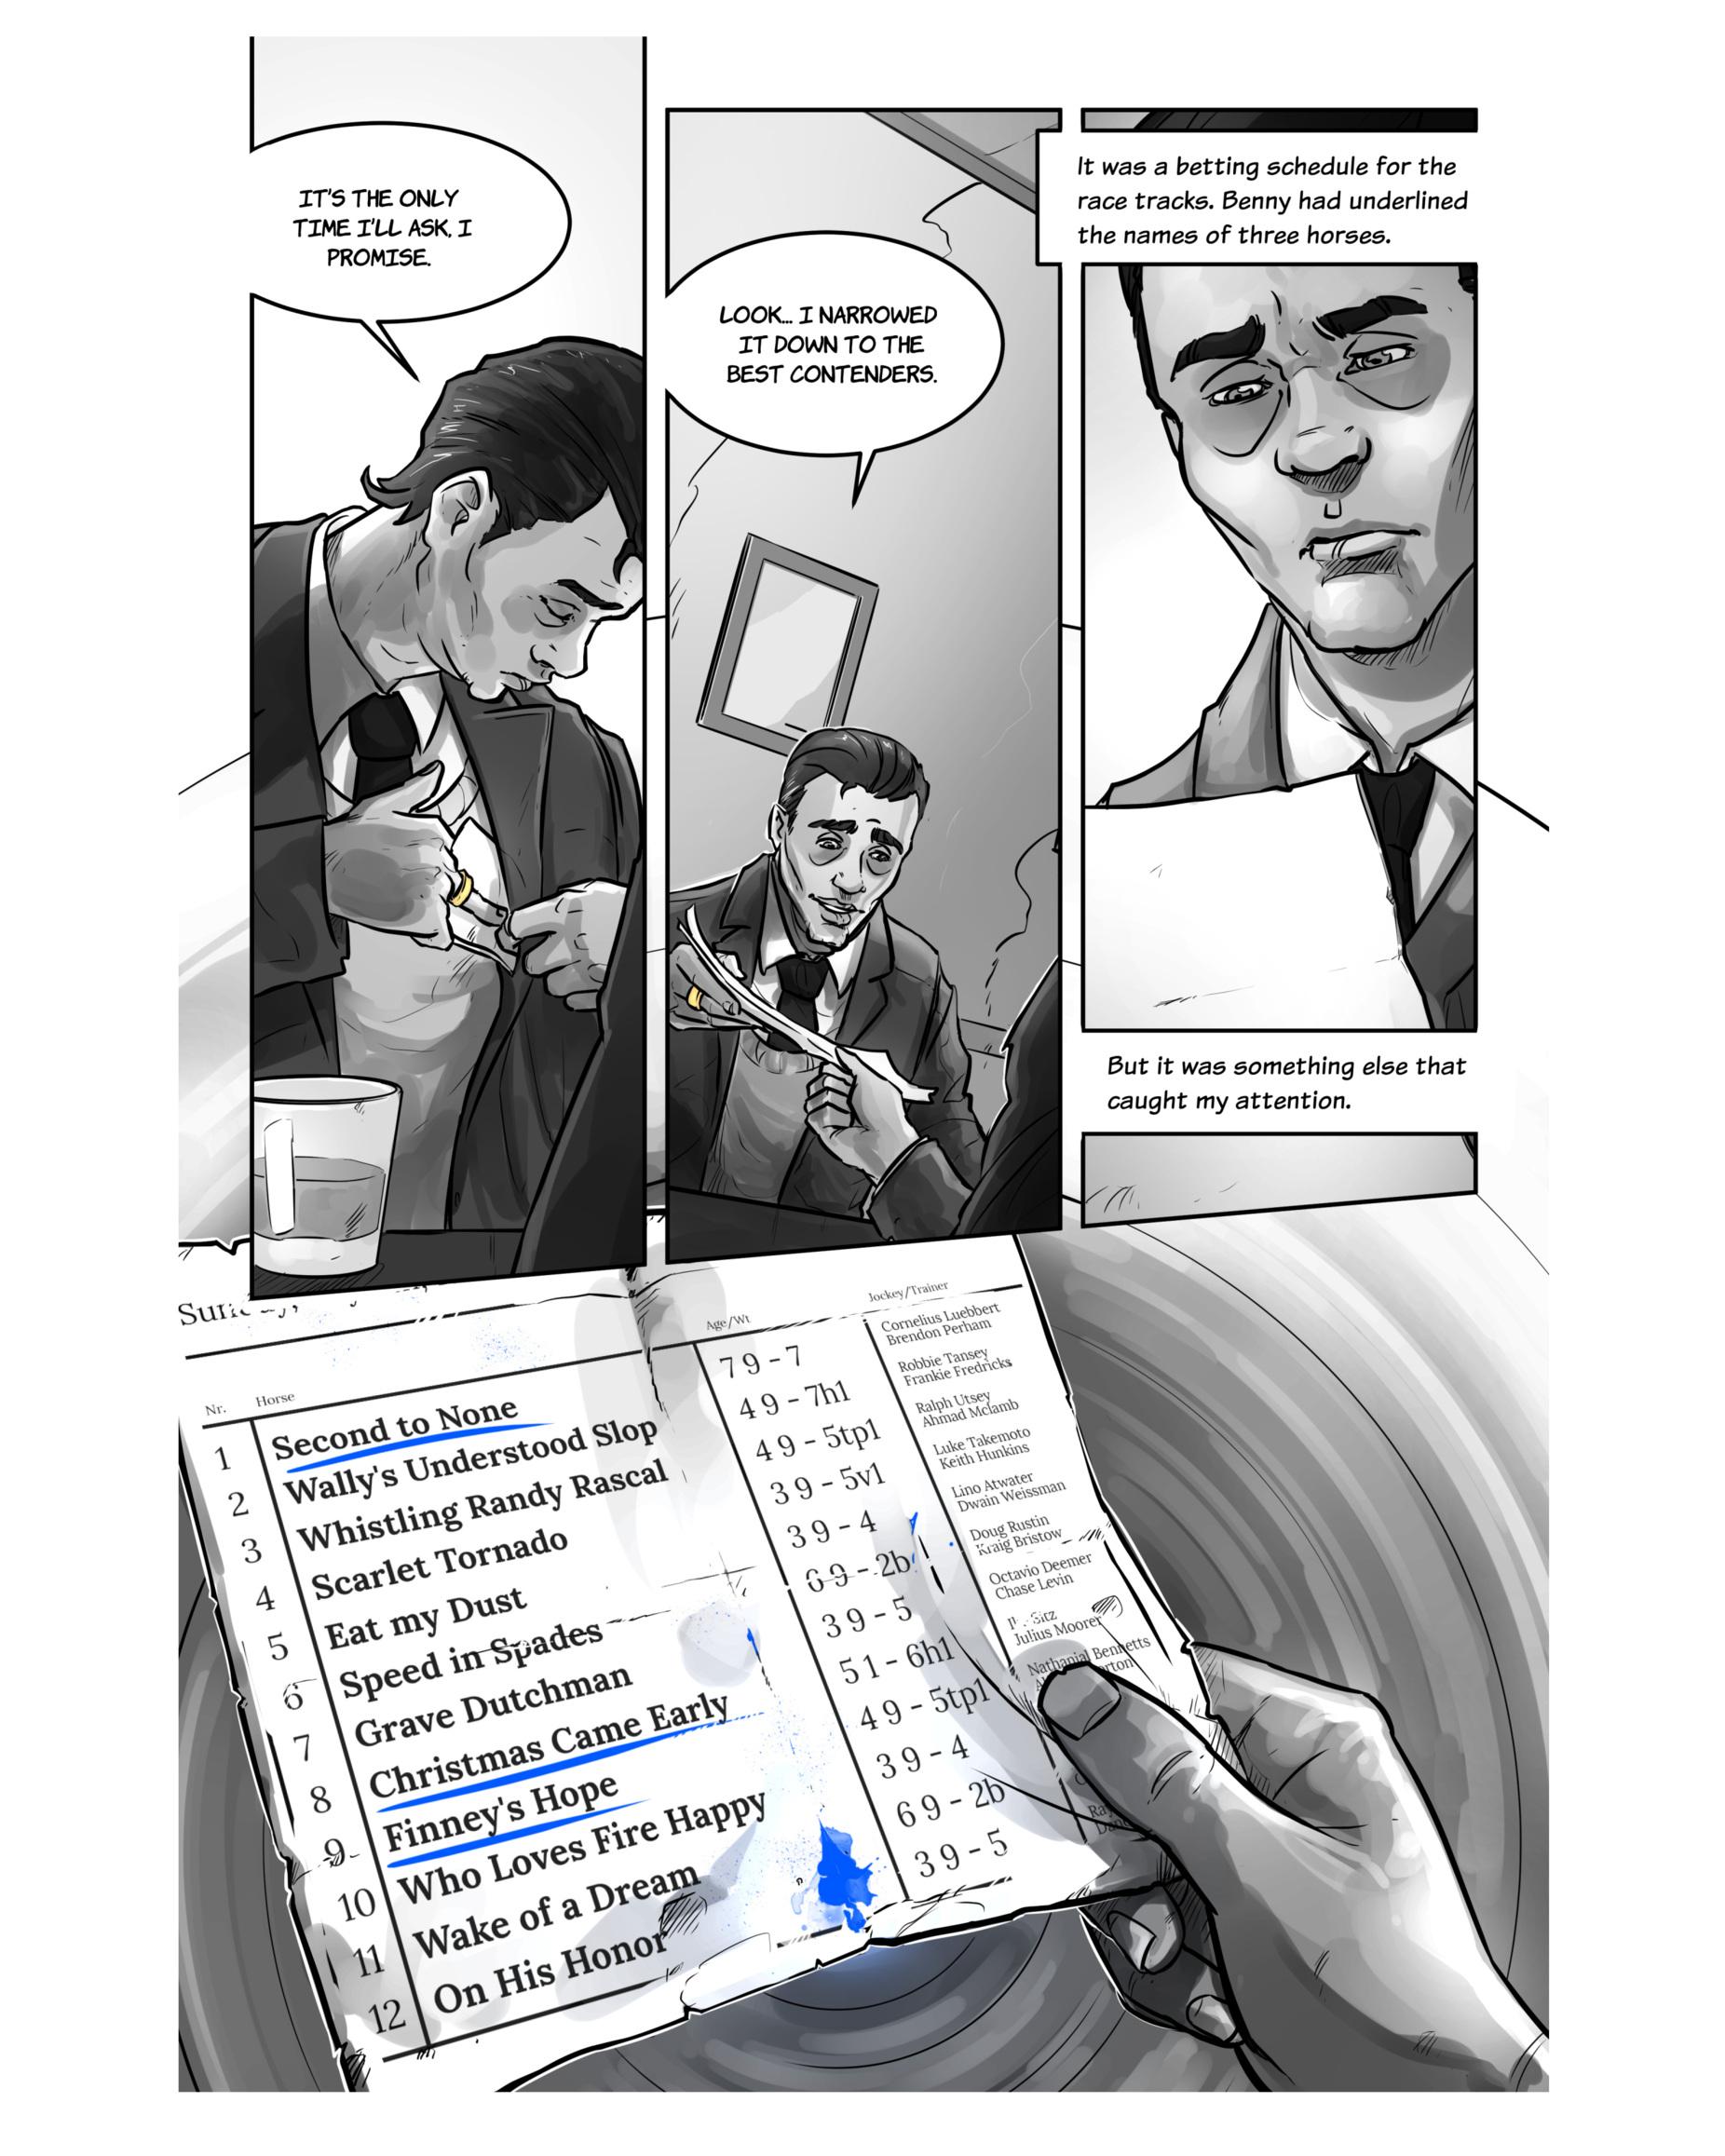 owatw_1+PAGE+15+WEB.jpg